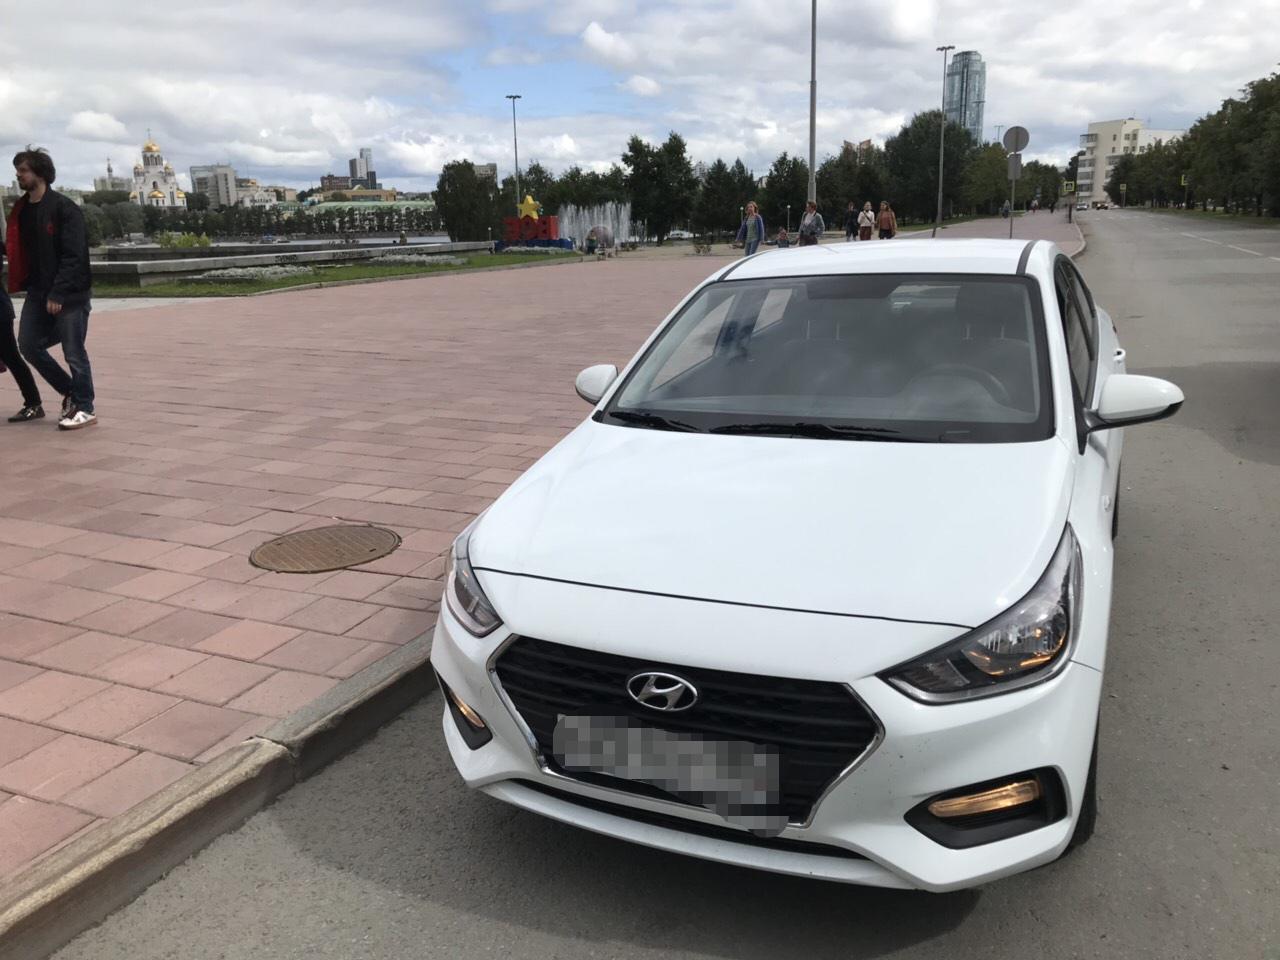 Прокат авто в екатеринбурге без водителя дешево без залога рено логан продажа автосалонах москвы